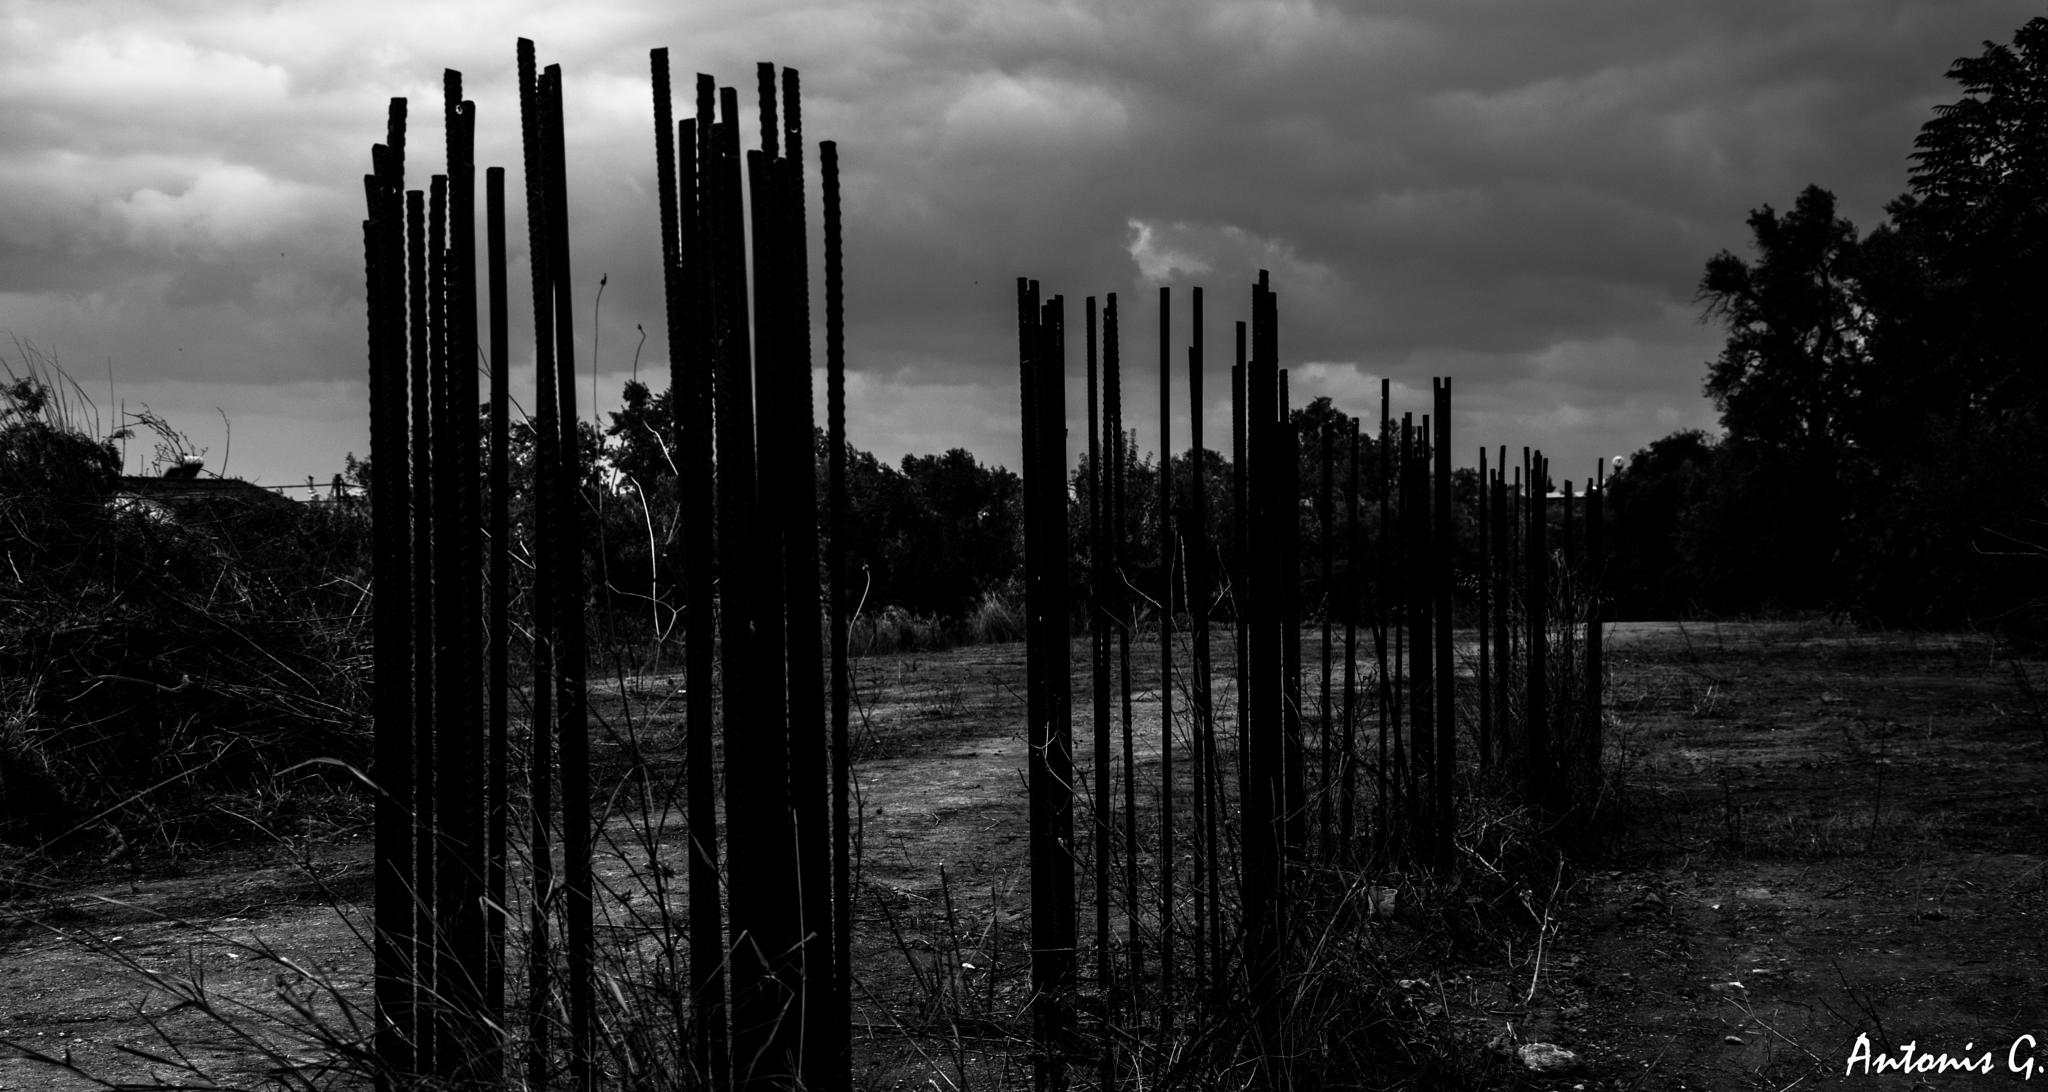 Untitled by Antonis Giakoumakis